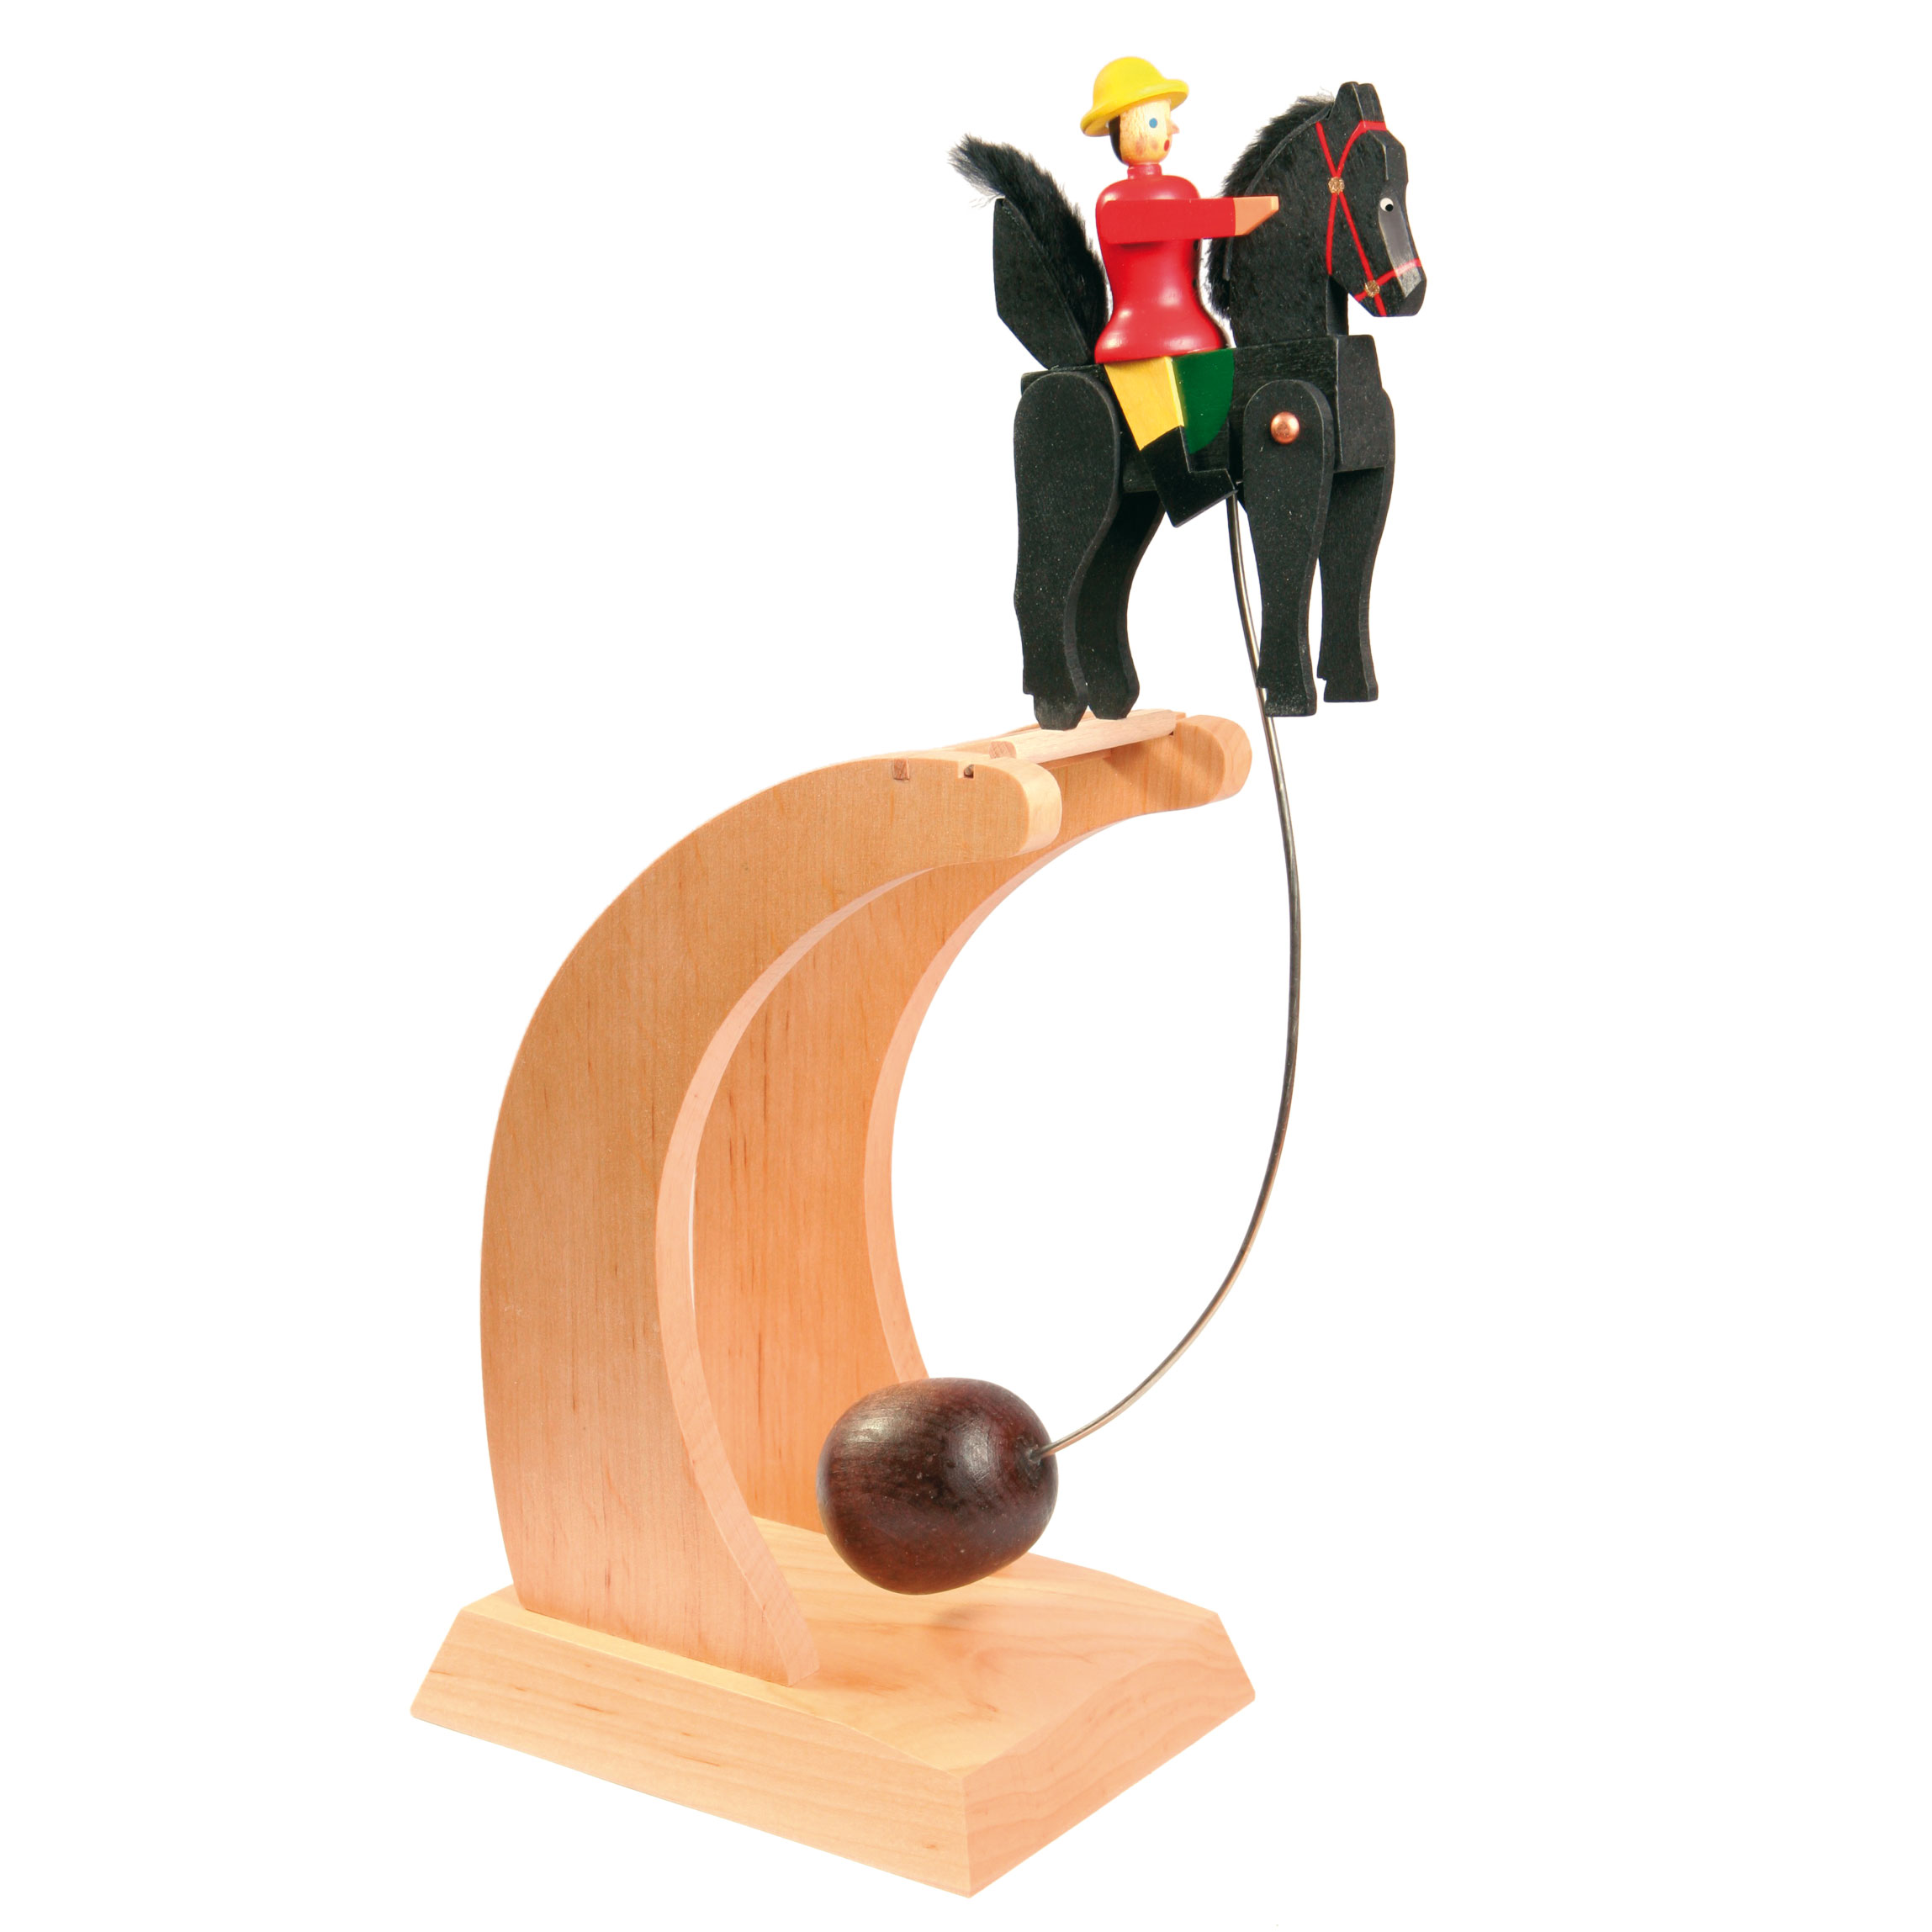 Wackelreiter mit Impulsgeber roter Reiter